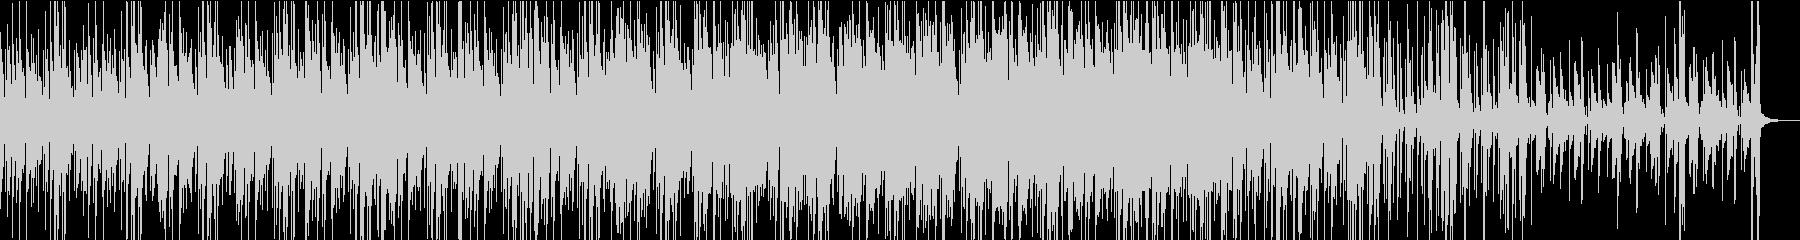 Funky Jazz Swing の未再生の波形